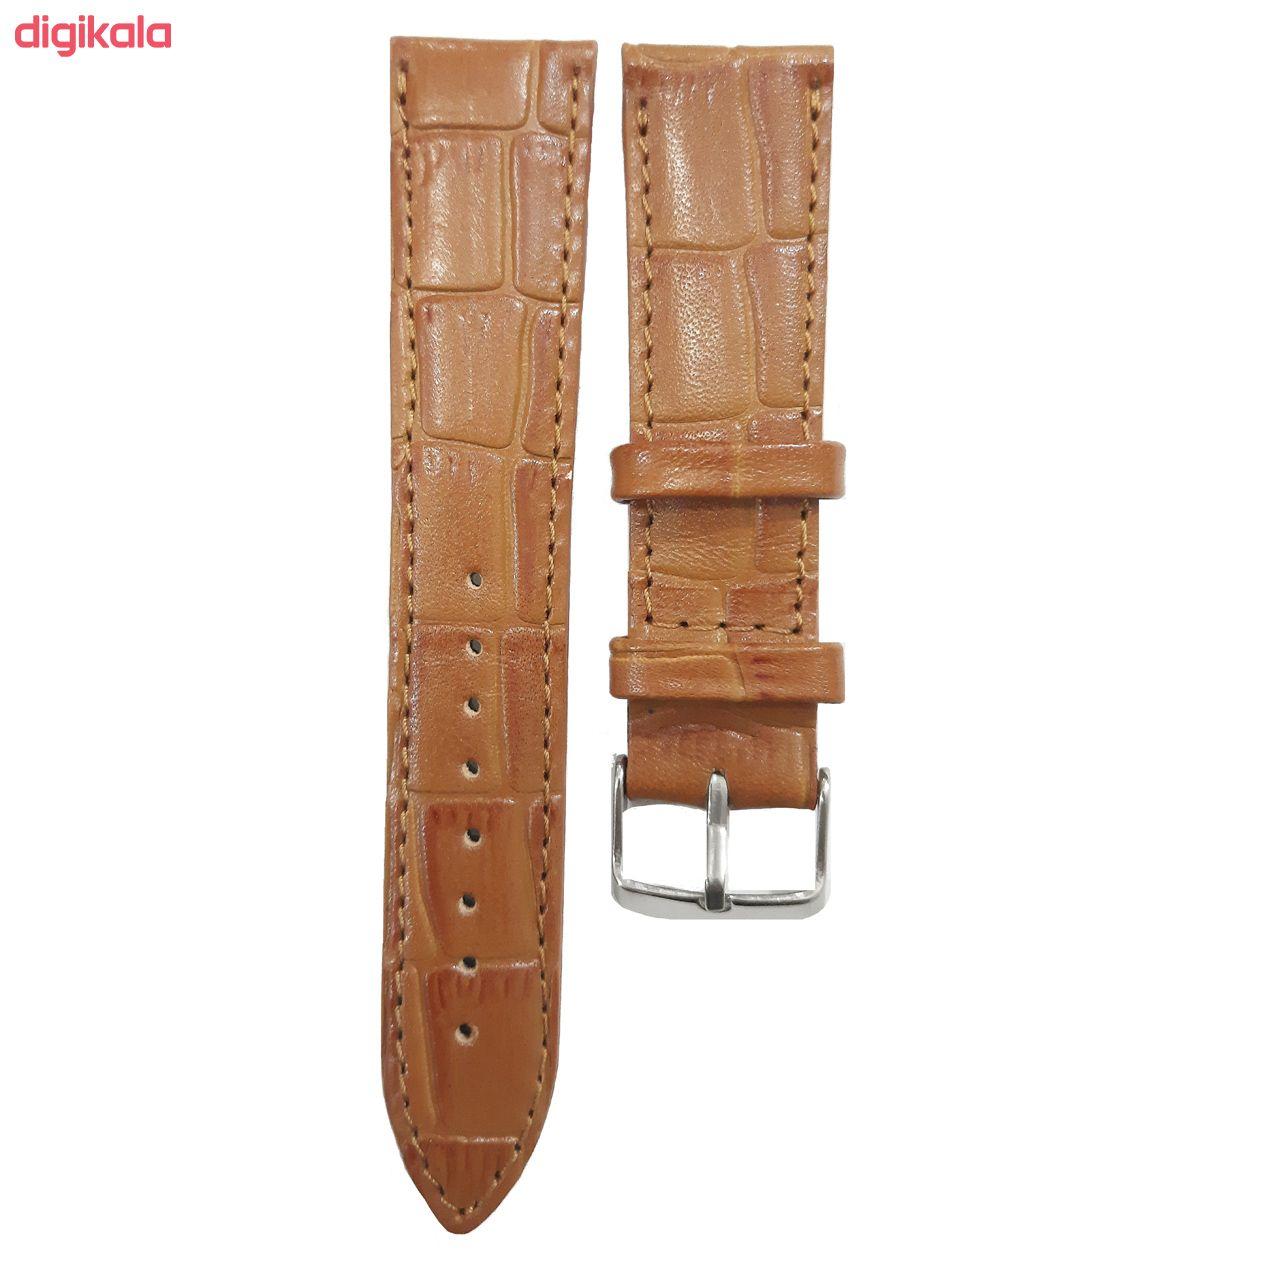 بند مدل WA 01 مناسب برای ساعت هوشمند سامسونگ Gear S2/Gear Sport/ Galaxy Watch 42mm main 1 4